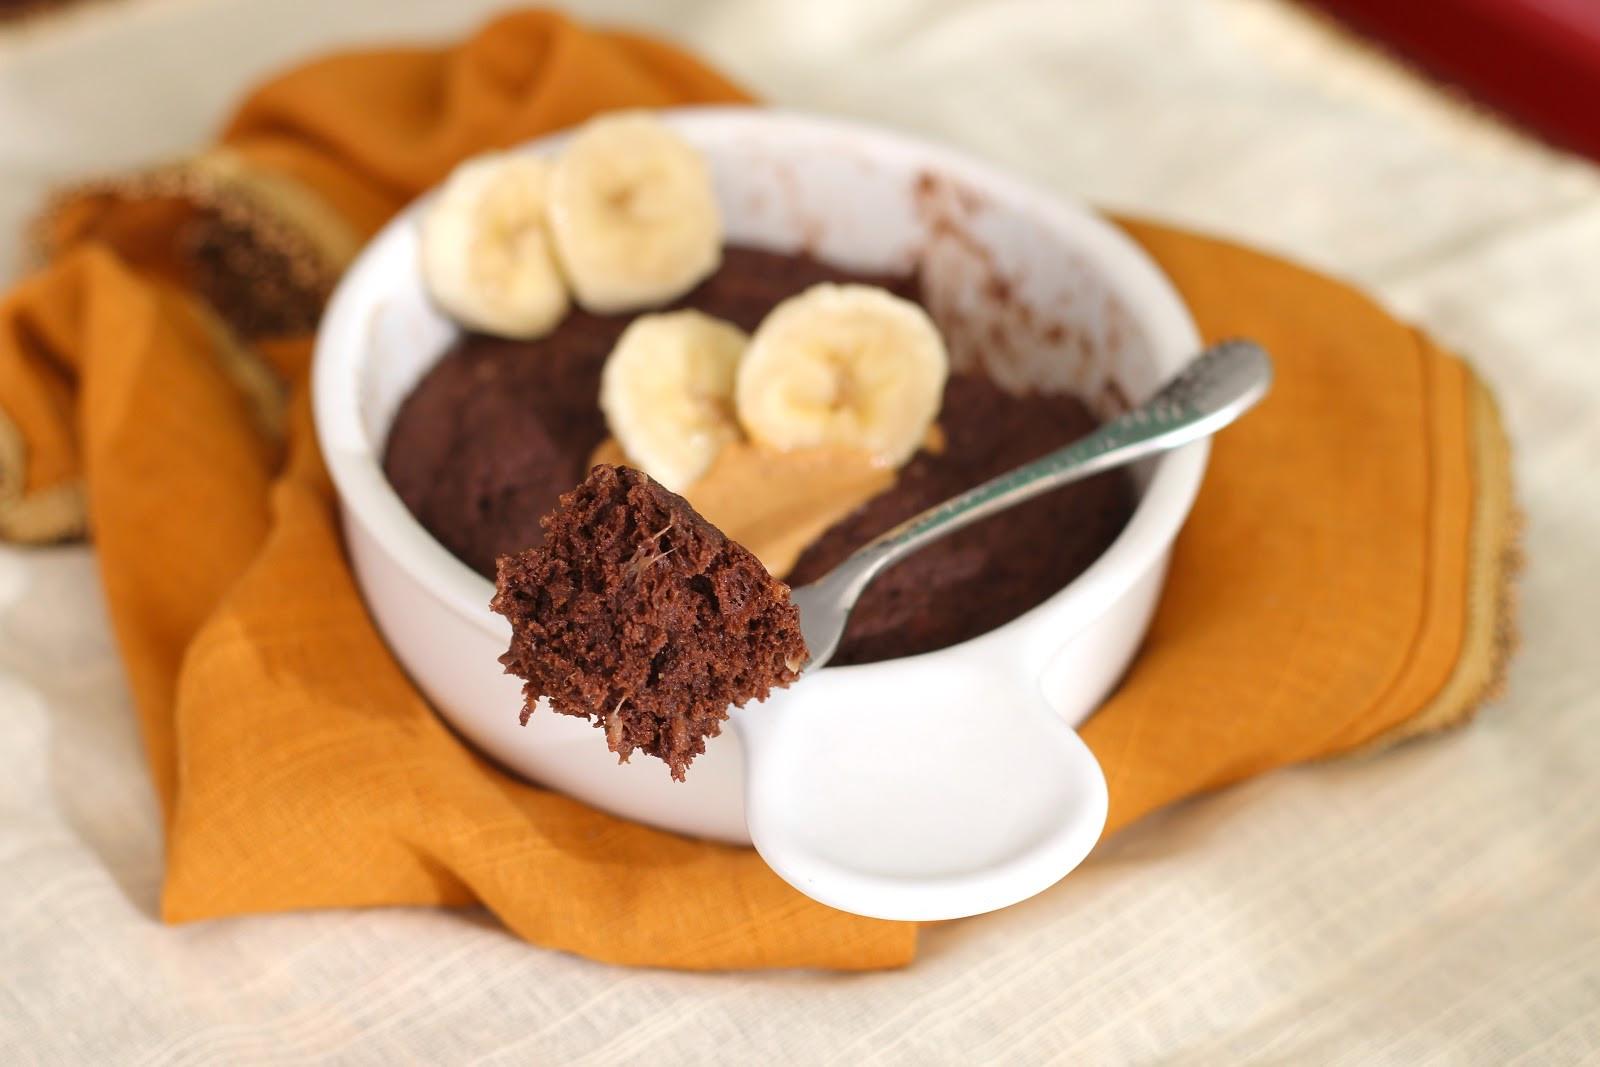 Banana Desserts Healthy  Healthy Single Serving Chocolate Peanut Butter Banana